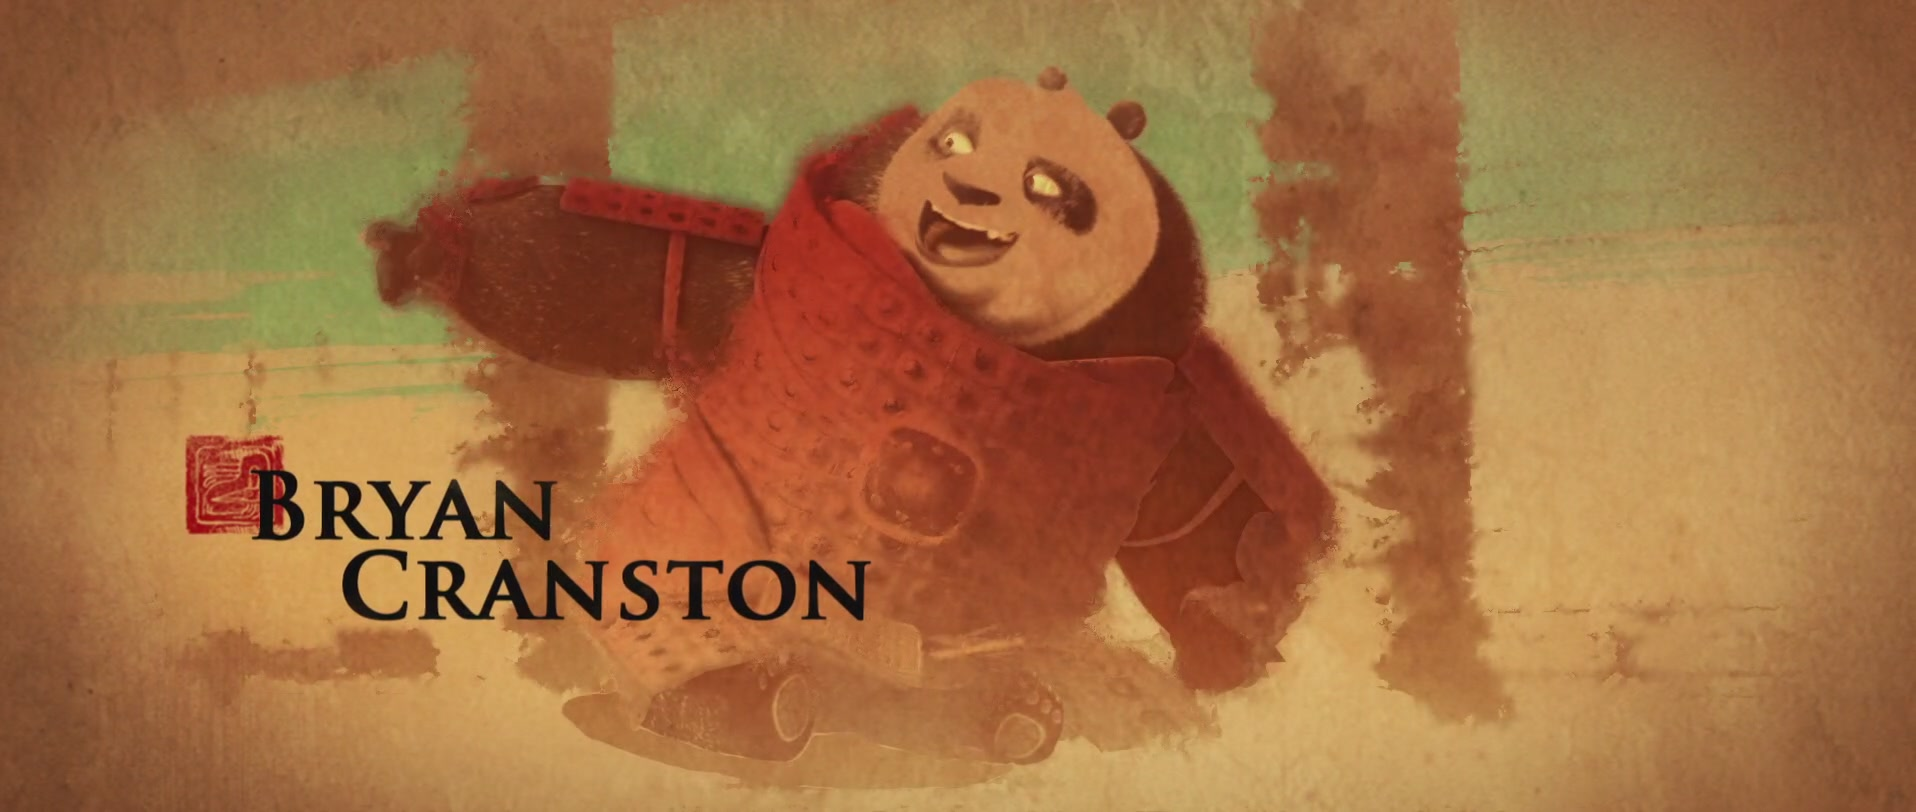 Bryan Cranston кунг-фу панда 3